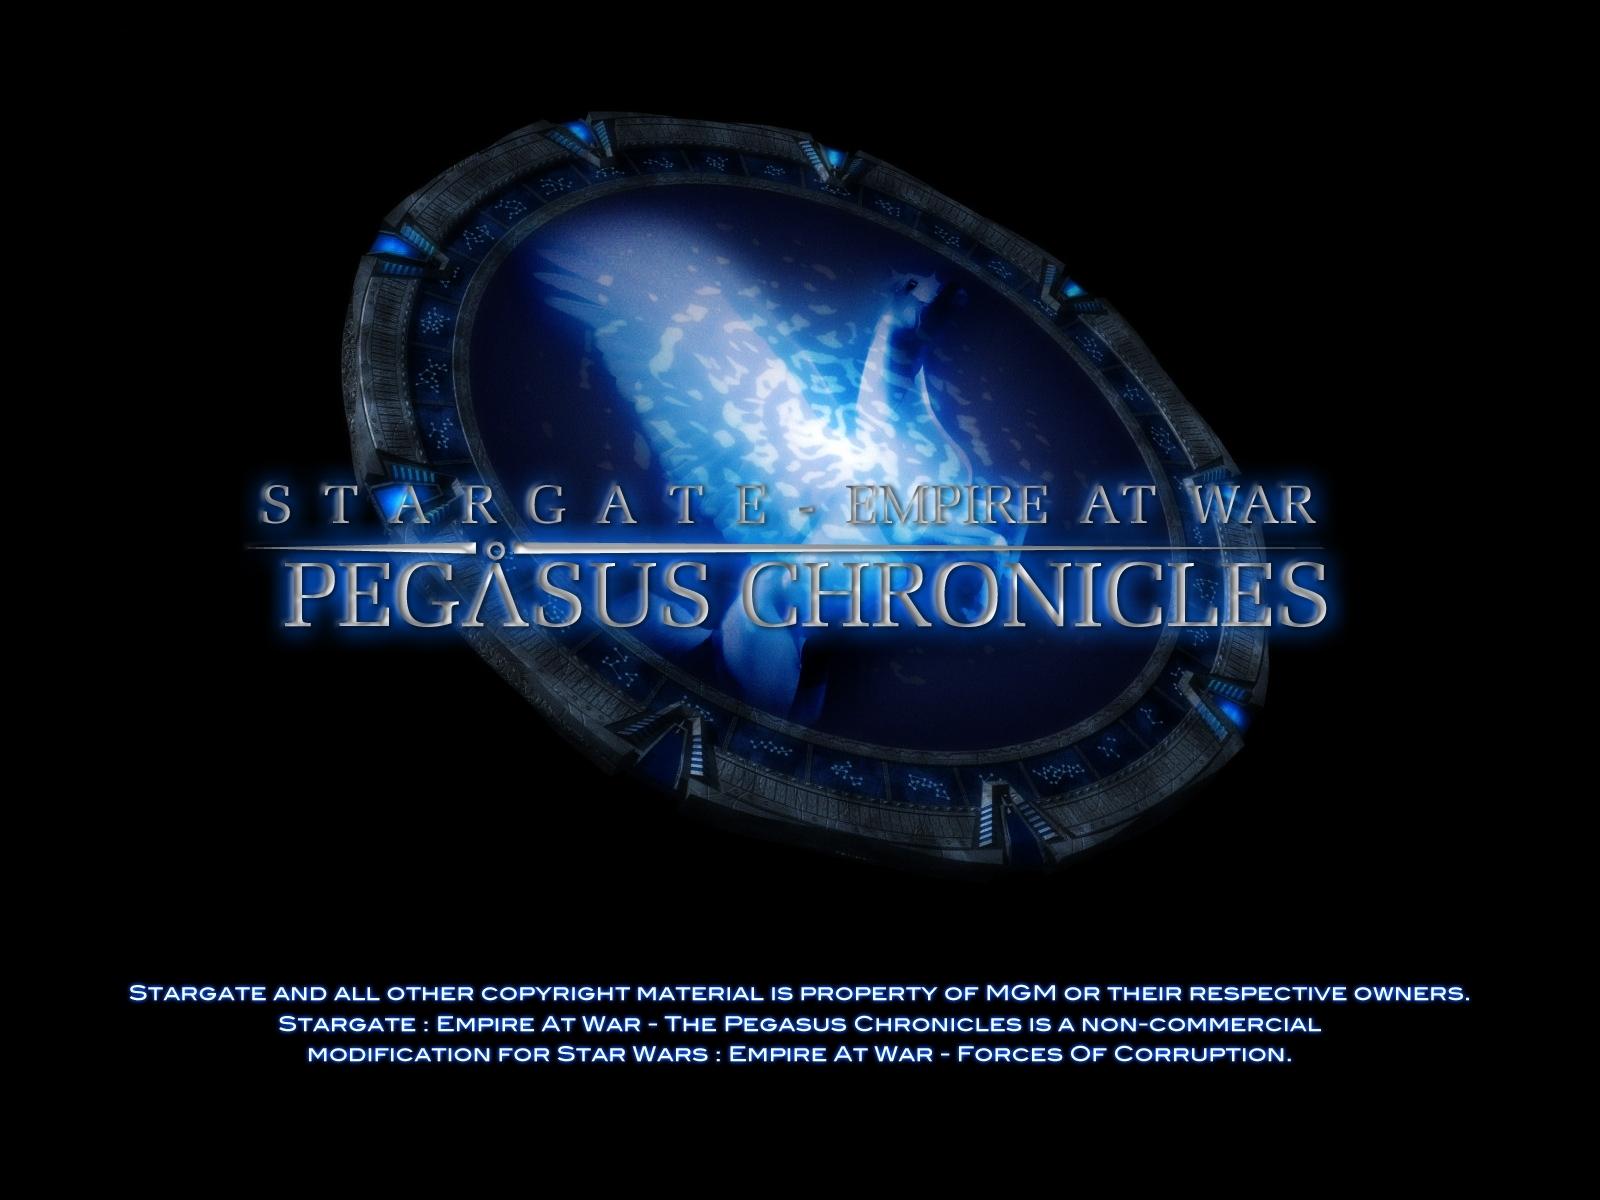 star wars empire at war forces of corruption stargate mod